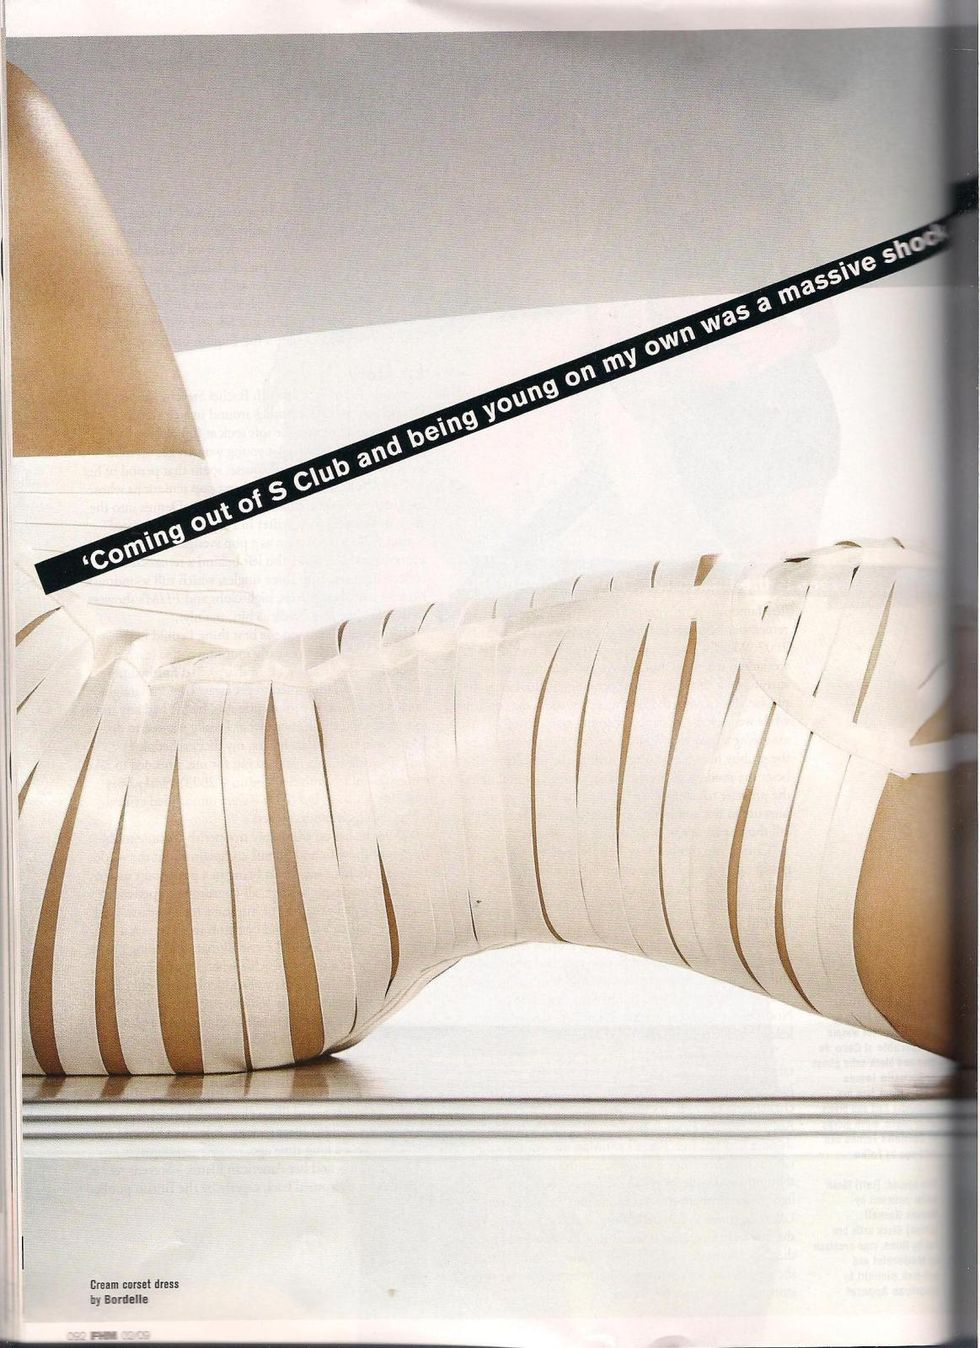 rachel-stevens-fhm-magazine-february-2009-mq-01